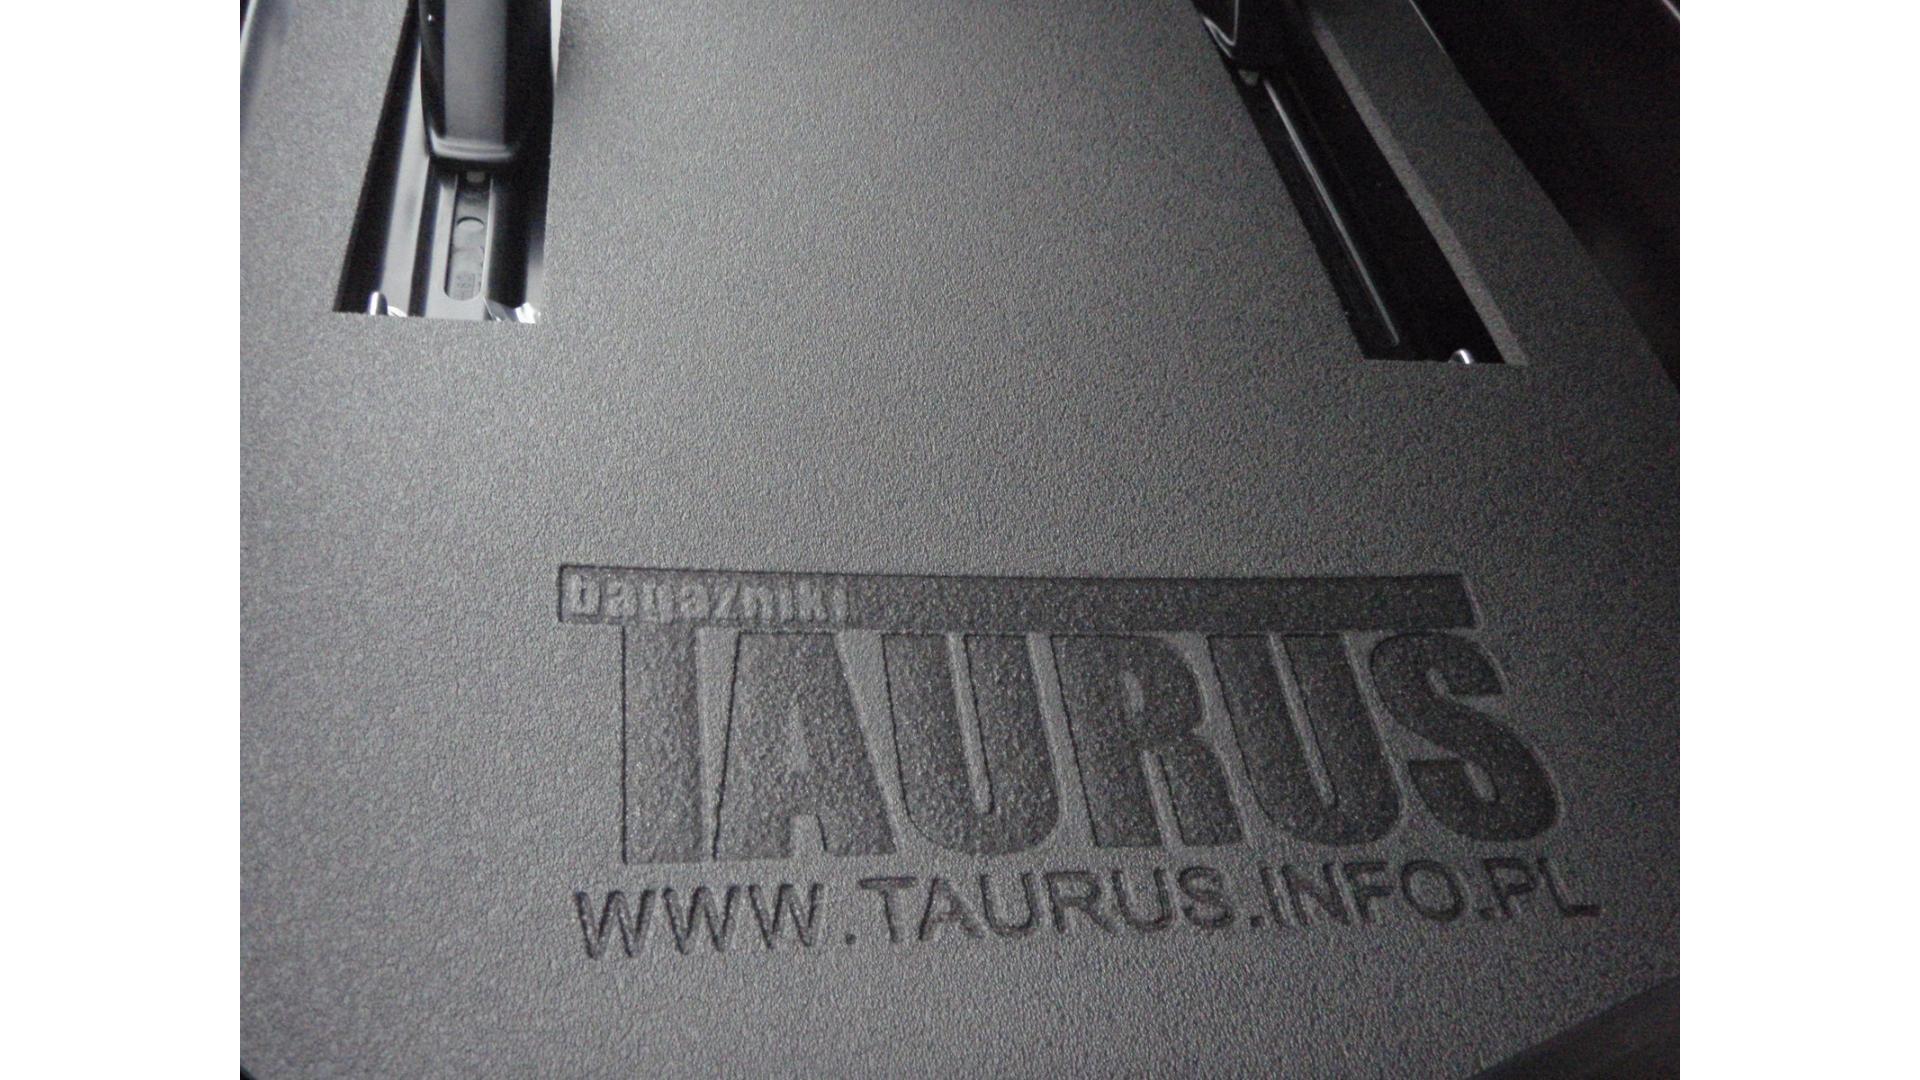 Taurus ochranní vložka do boxu A 900 (205x72 cm)